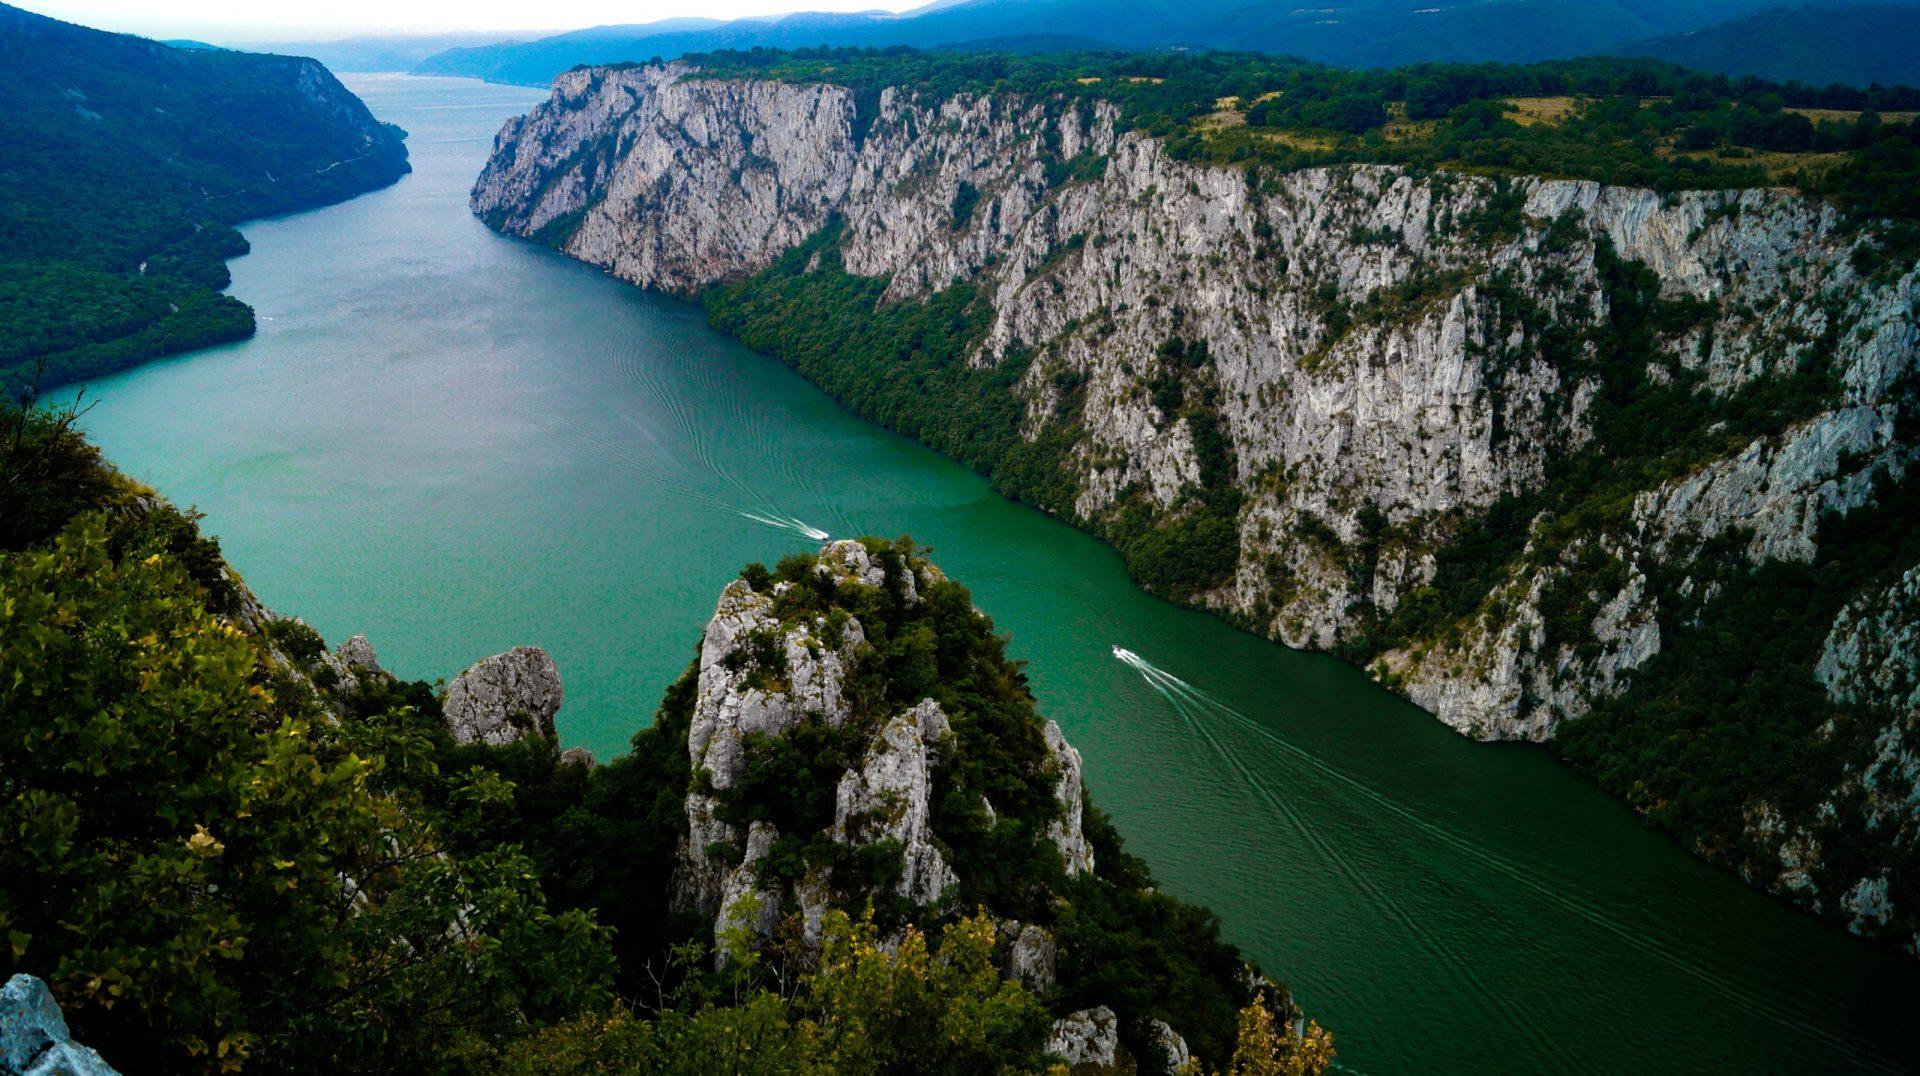 The Iron Gates - Danube